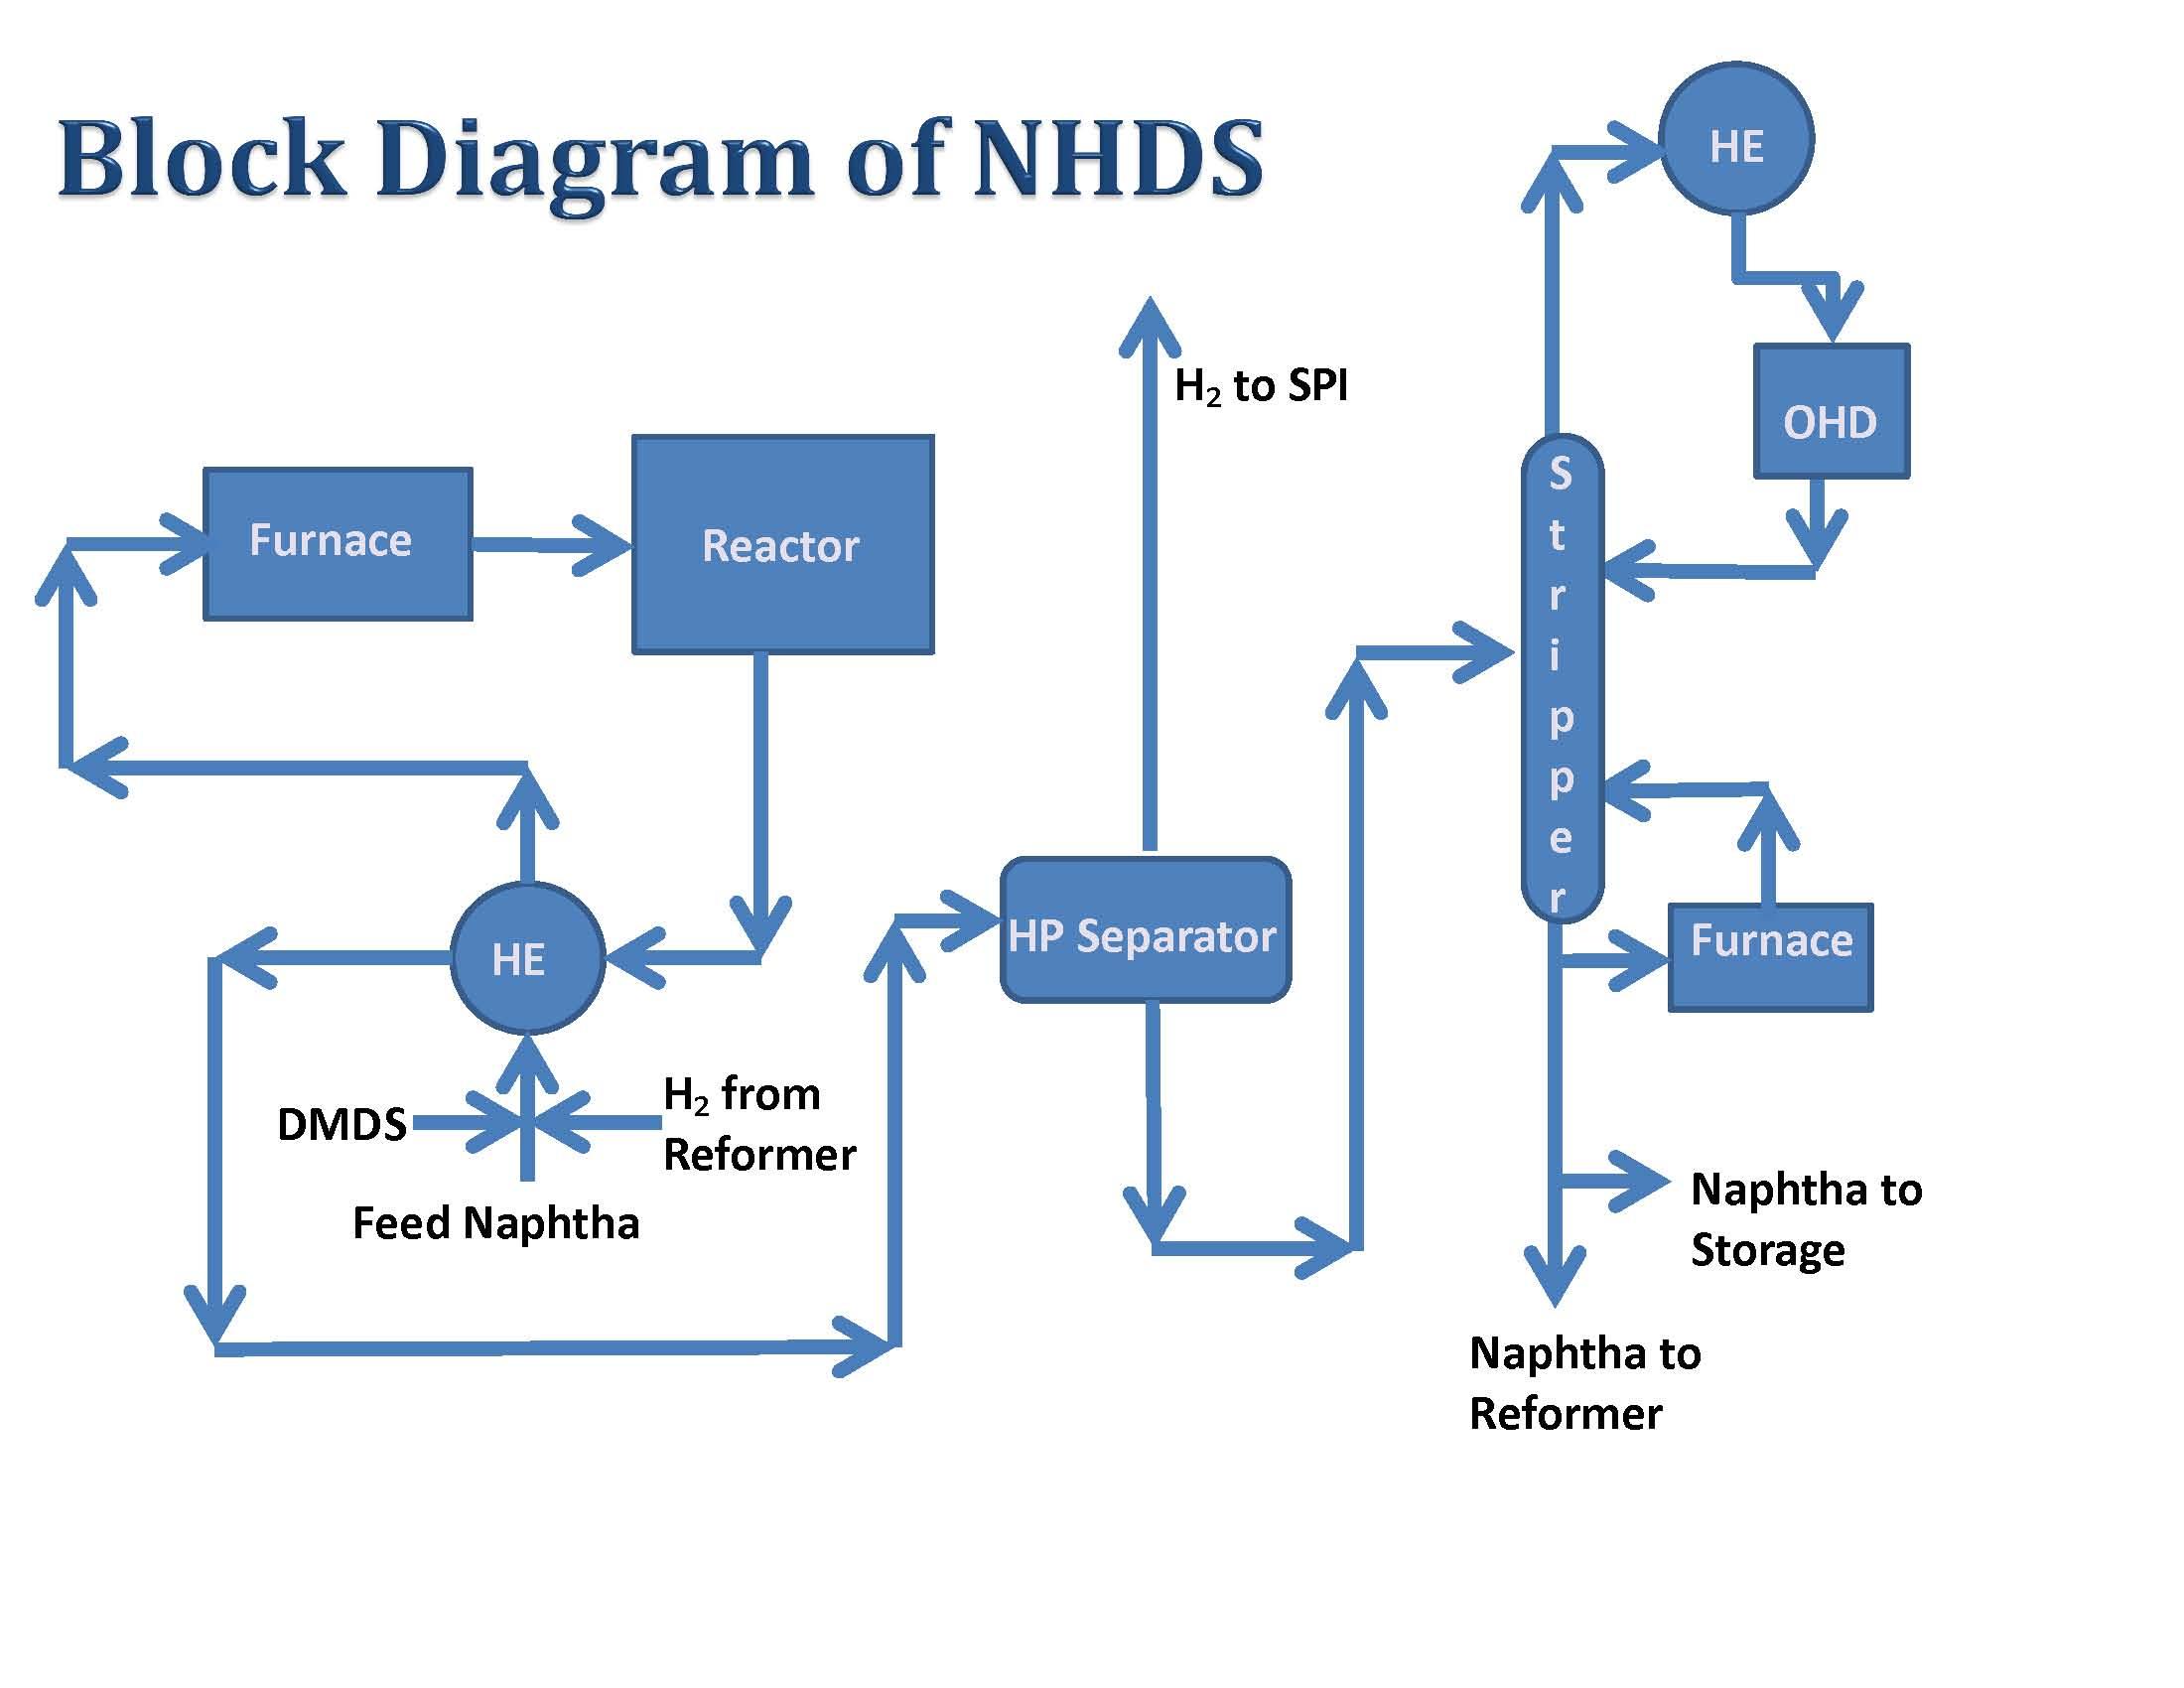 MPE MANN Refinery Naphtha Hydro Desulfurization Plant Commissioning